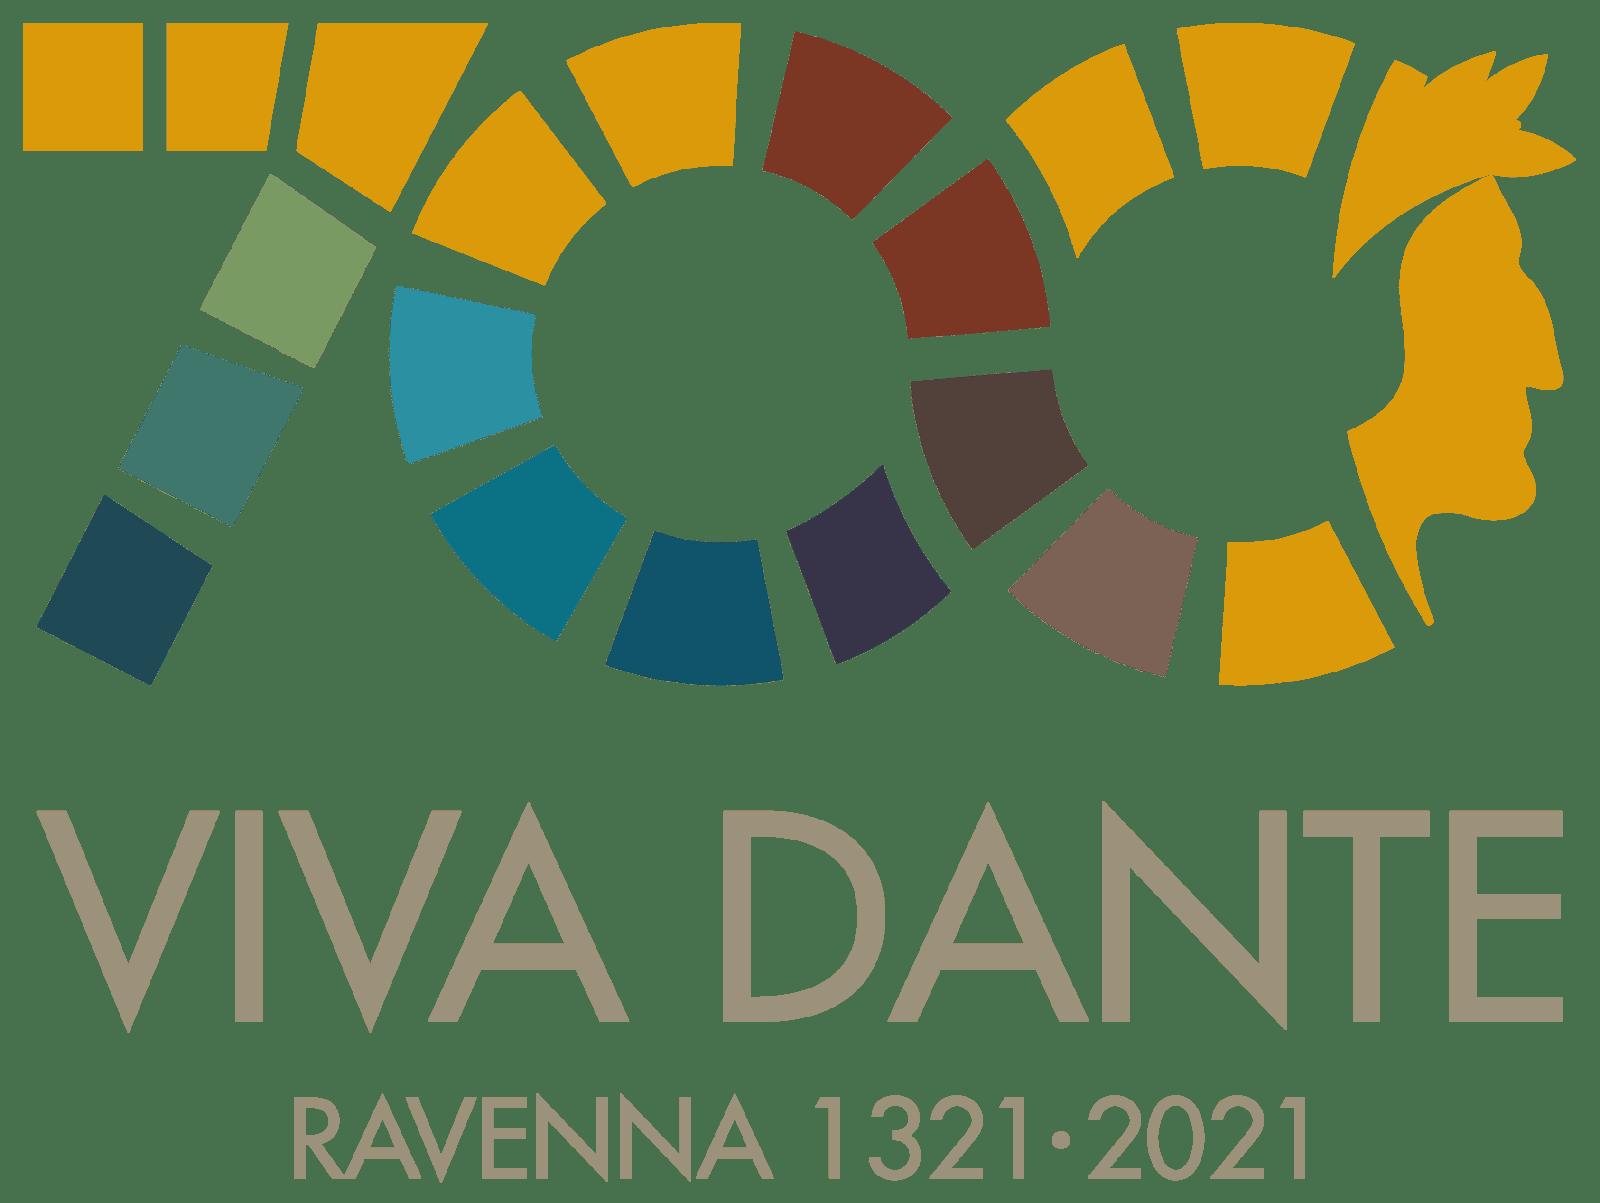 logo manifestazione 700 viva dante ravenna 1321-2021